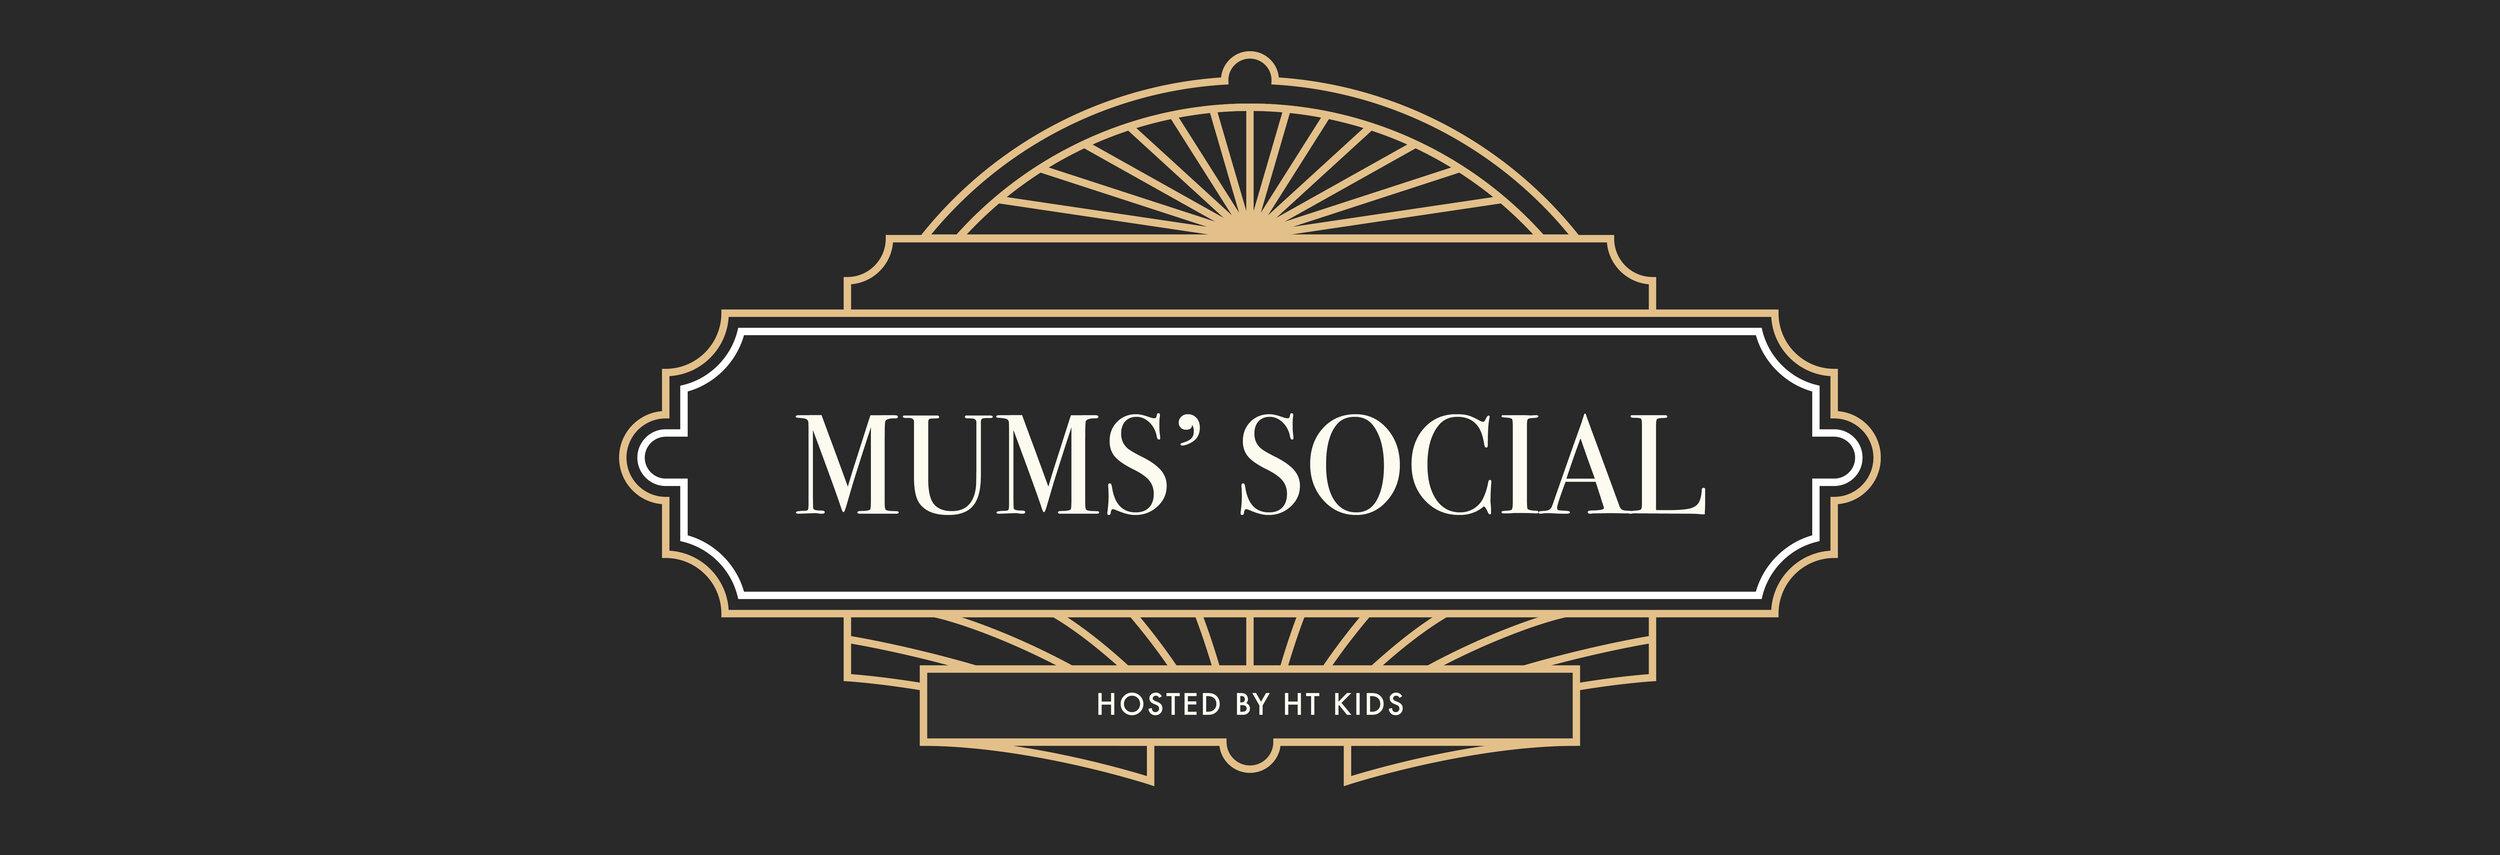 HT Web Event Headers_Mums.jpg